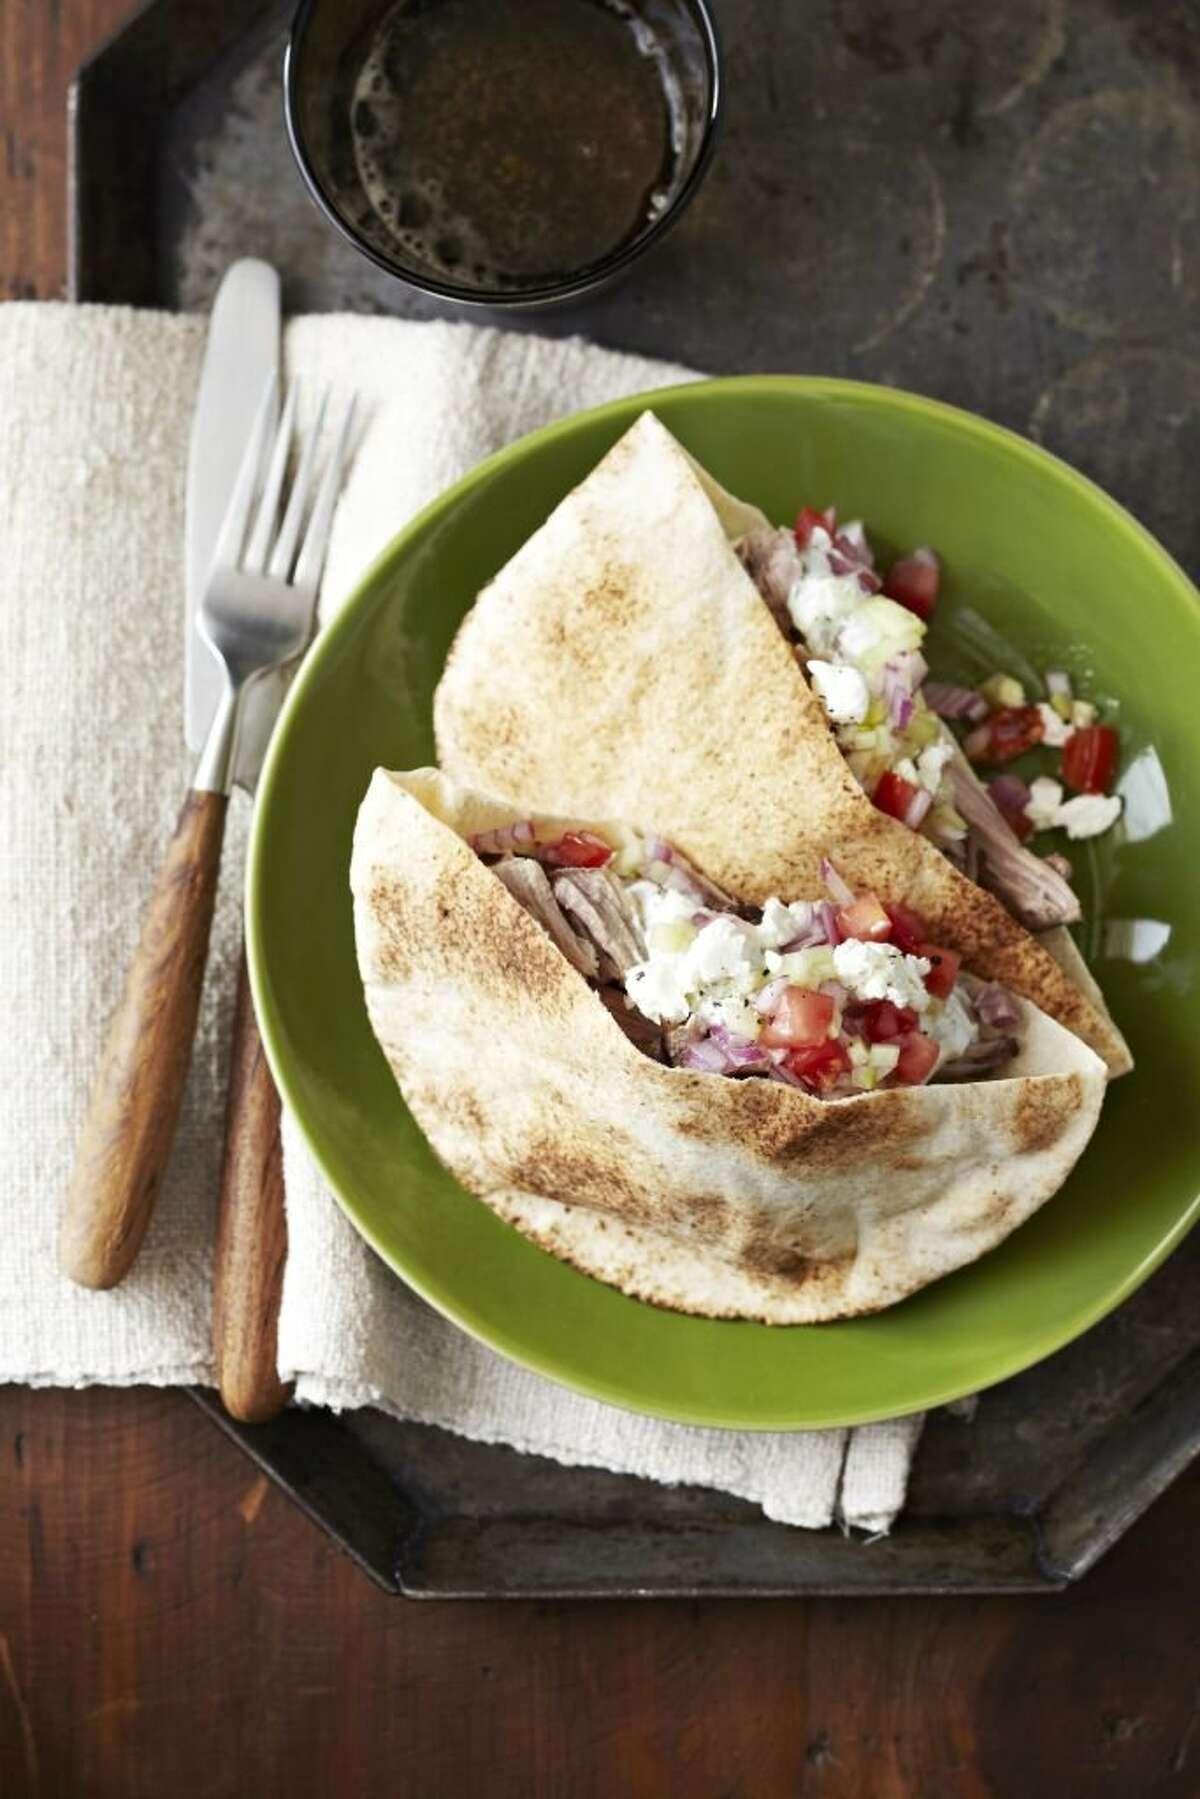 Delish0229: Good Housekeeping recipe for Turkey Pitas with Cucumber Salad.